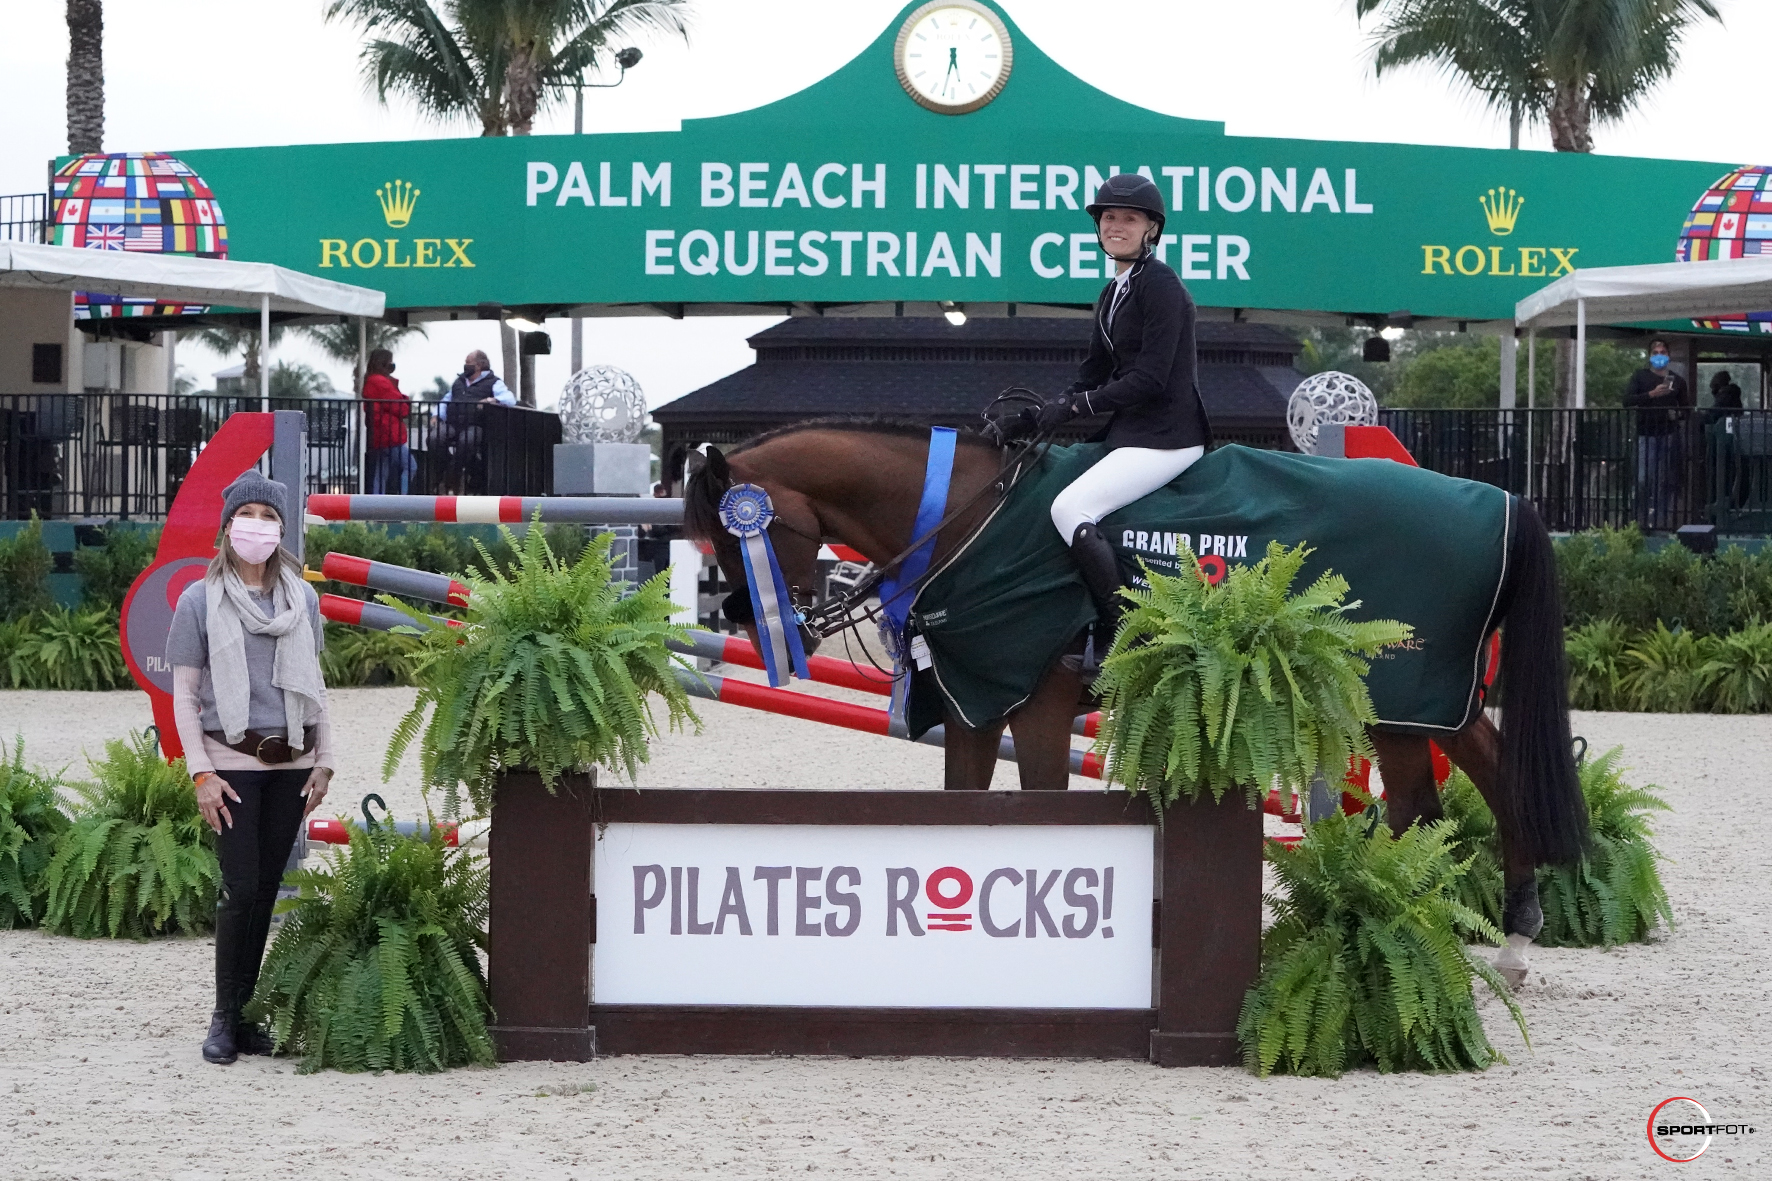 Hilary McNerney and Singuletto won the $30,000 Pilates Rocks Grand Prix ©Sportfot